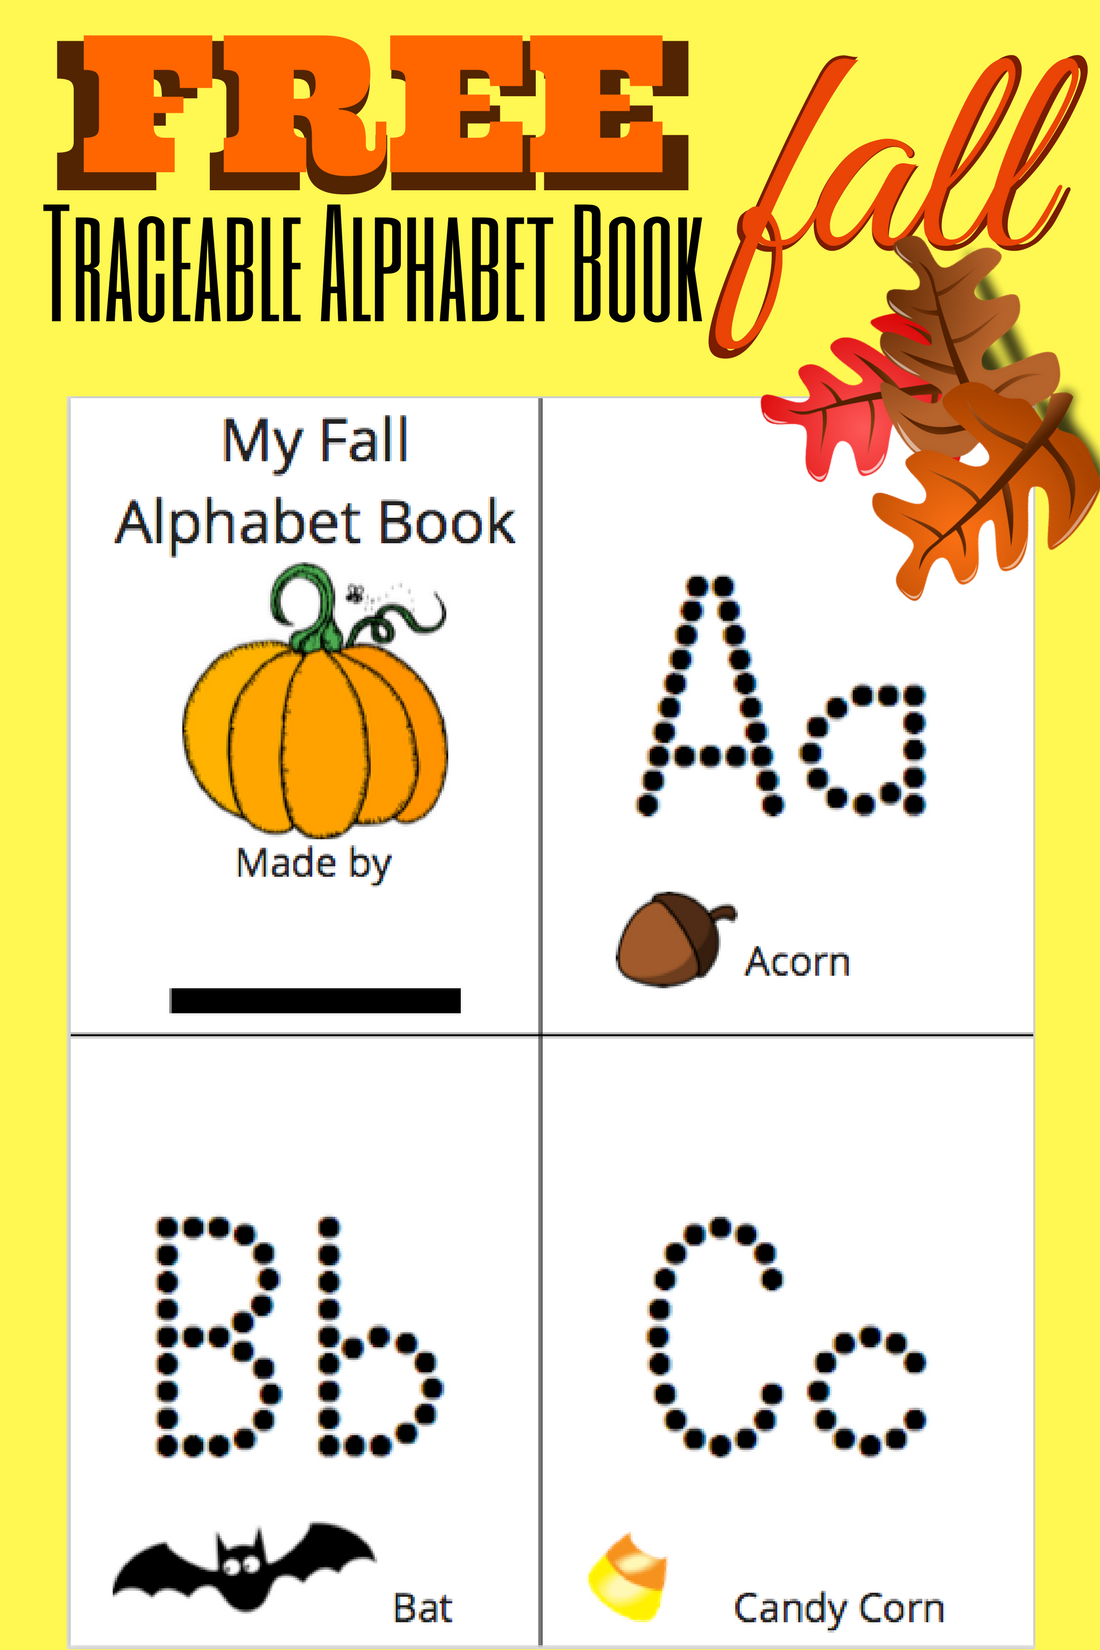 Traceable Alphabet Book Free Printable Fall Theme